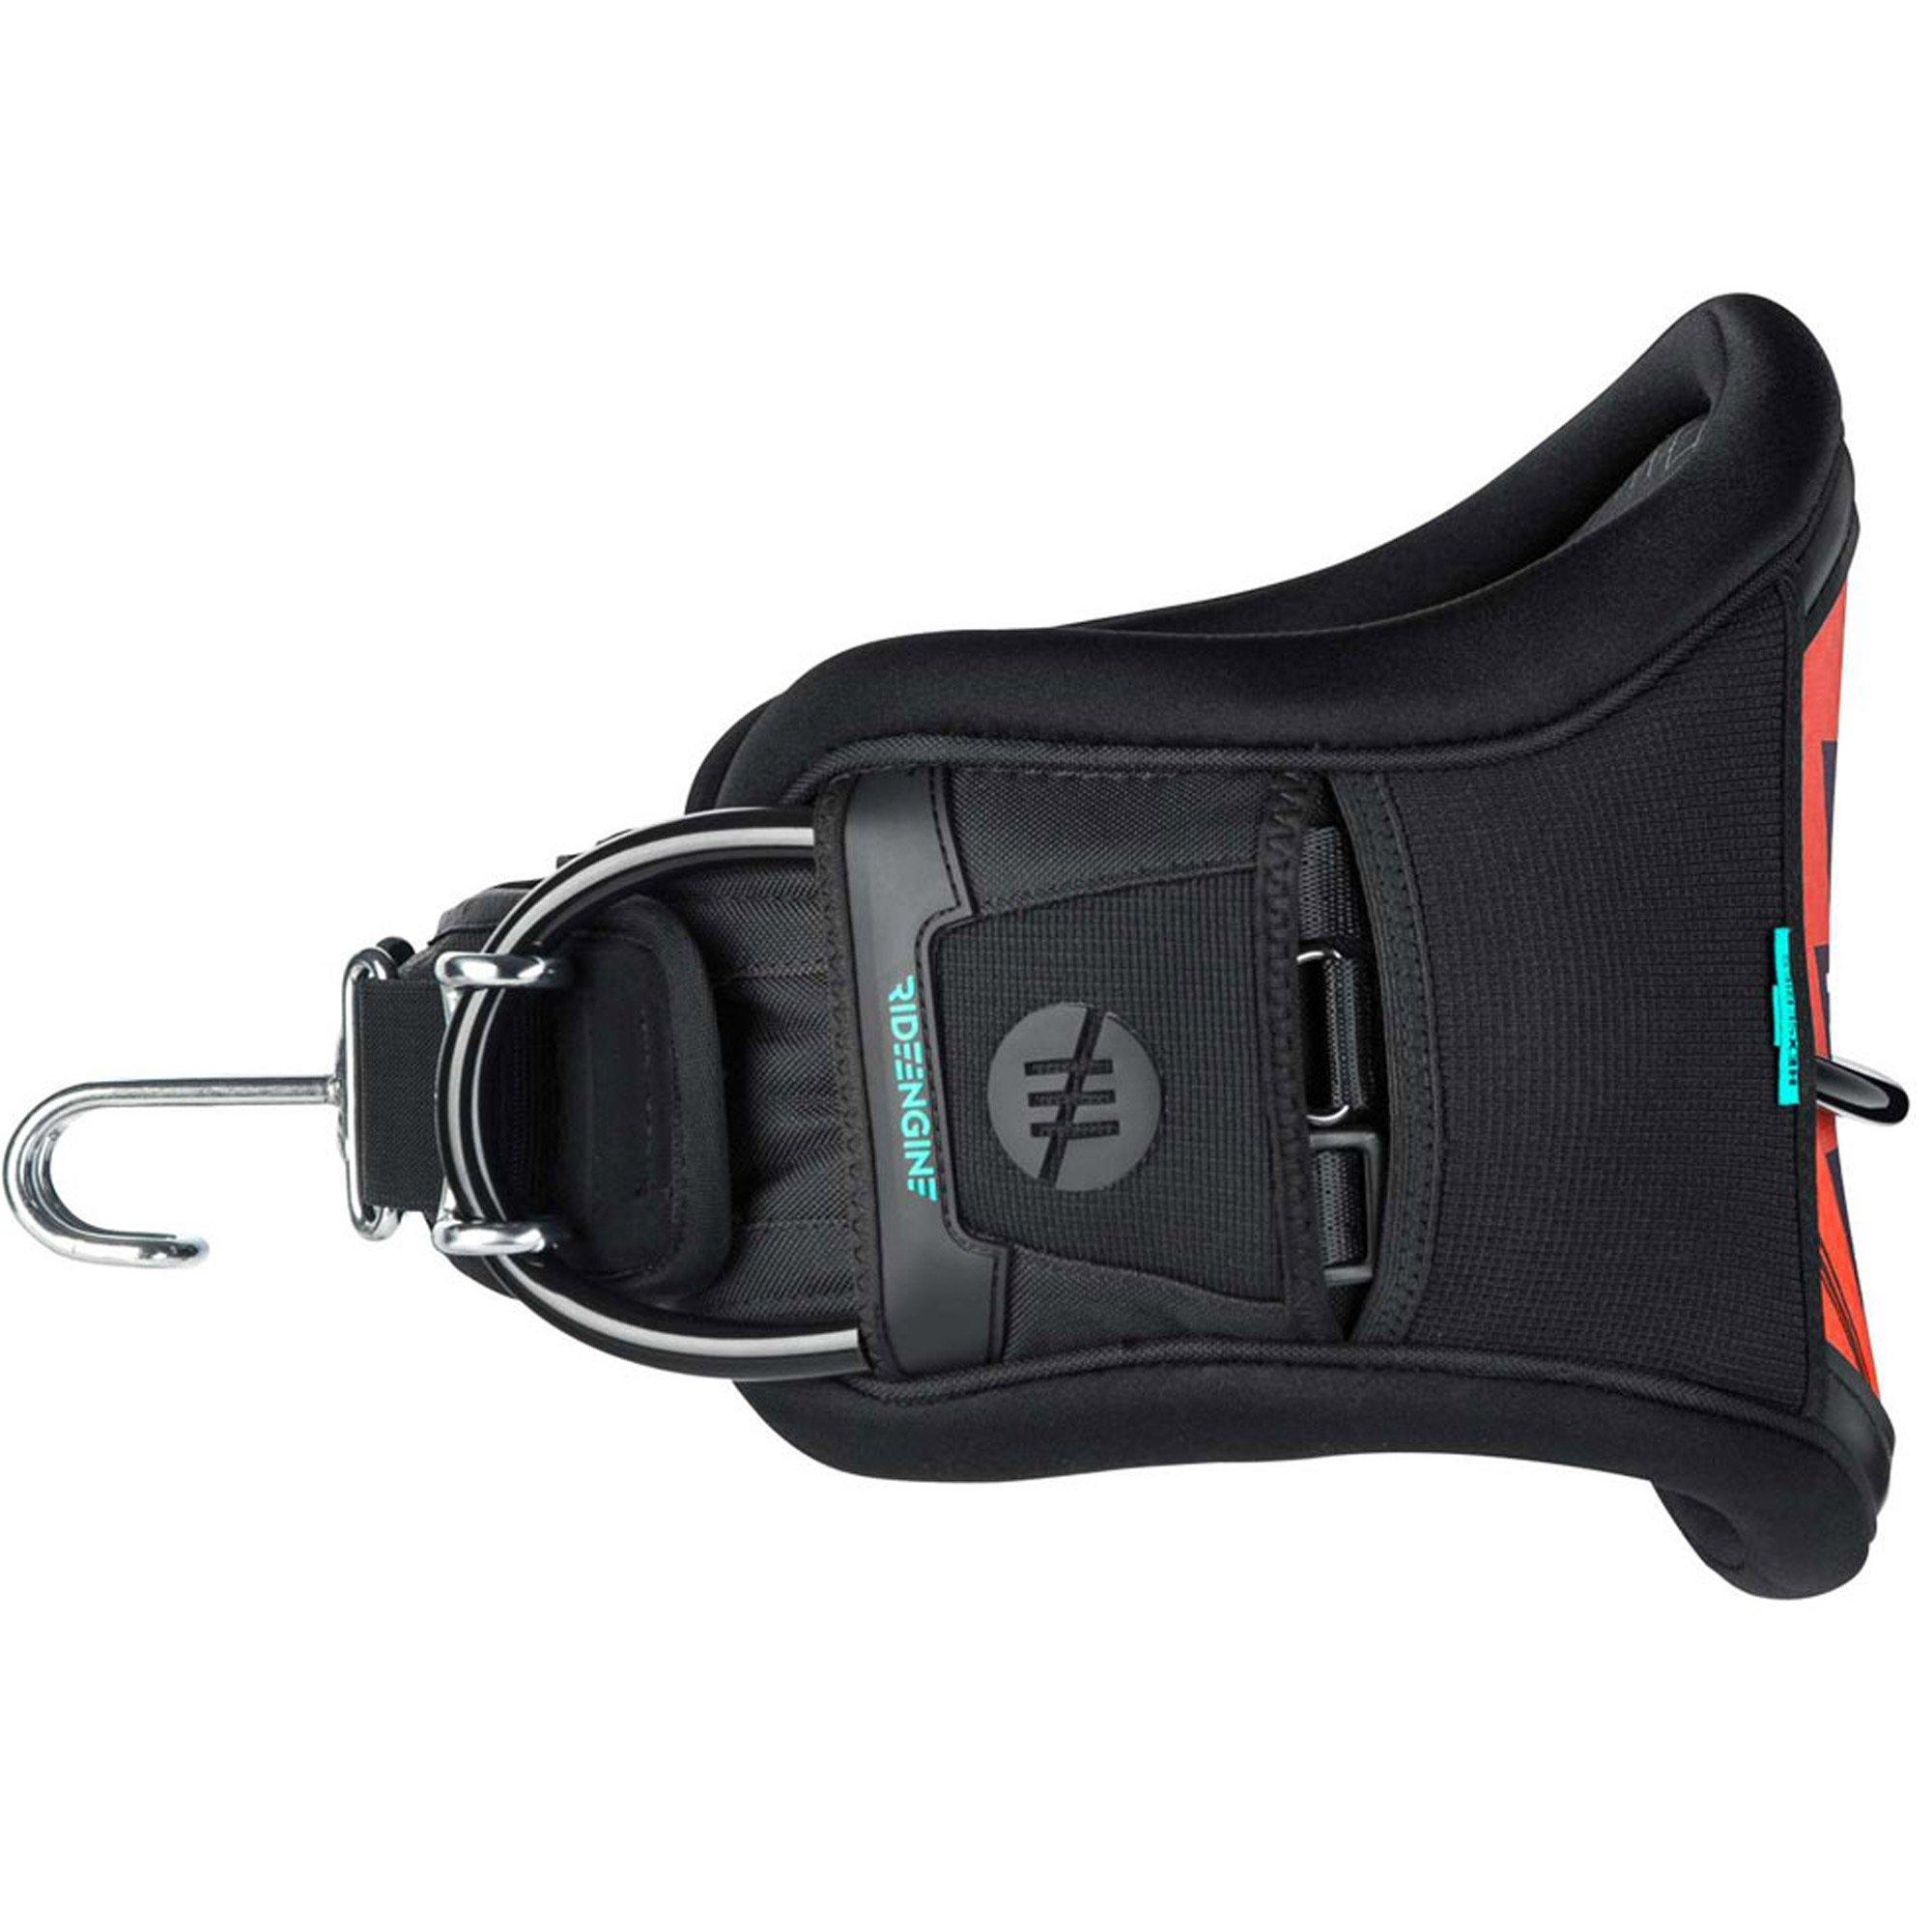 Ride Engine Kiteboarding HarnessHex-Core Orange Harness M by Ride Engine (Image #4)